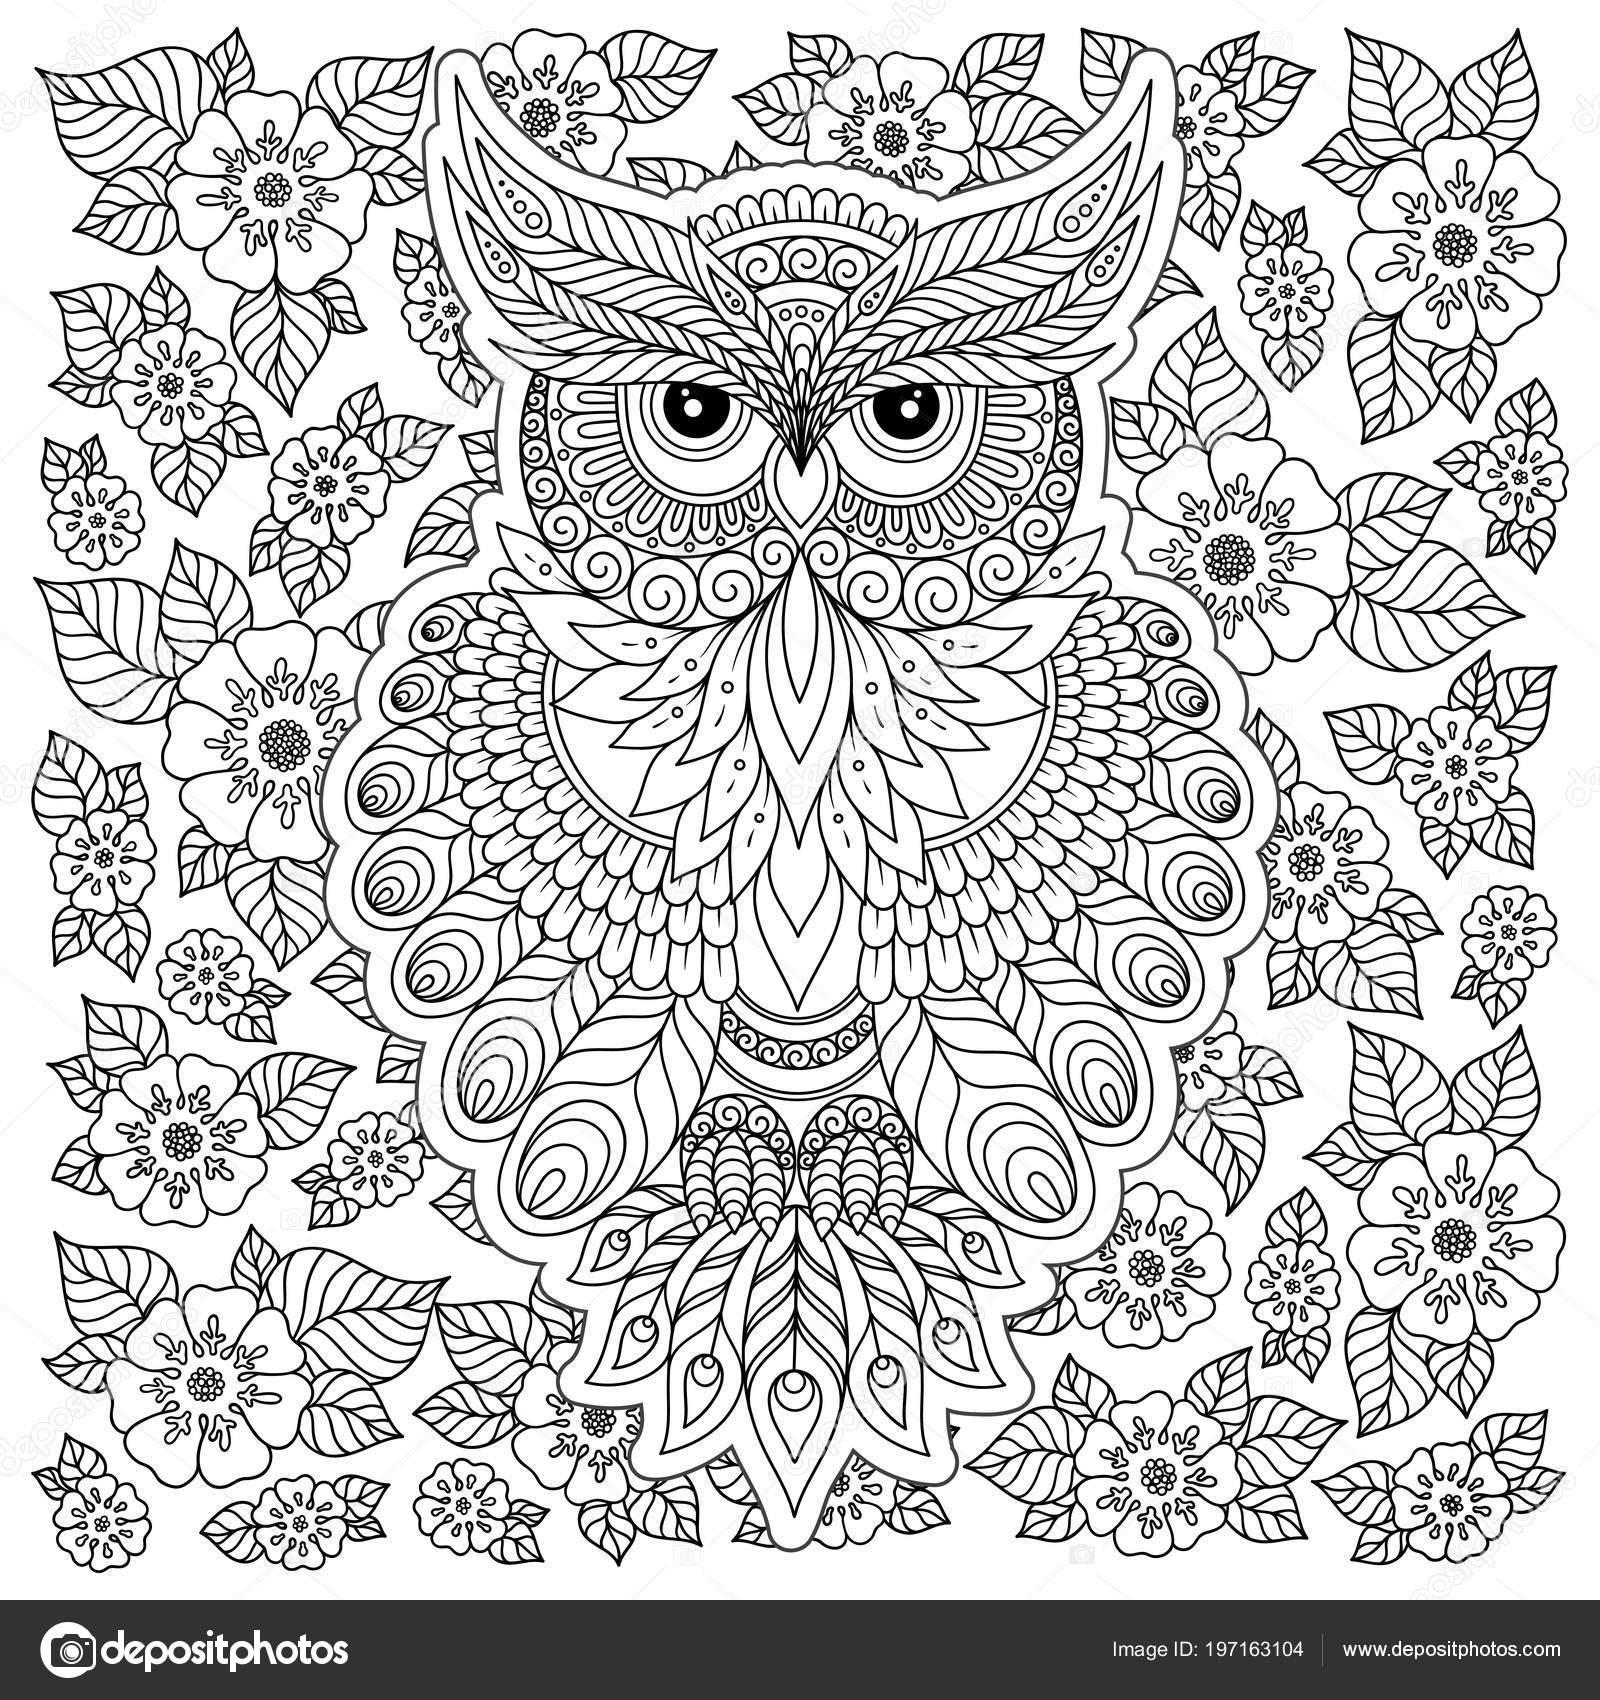 Volwassen Kleurplaten Uil.Decoratieve Uil Volwassen Stressprogramma Kleurplaat Zwart